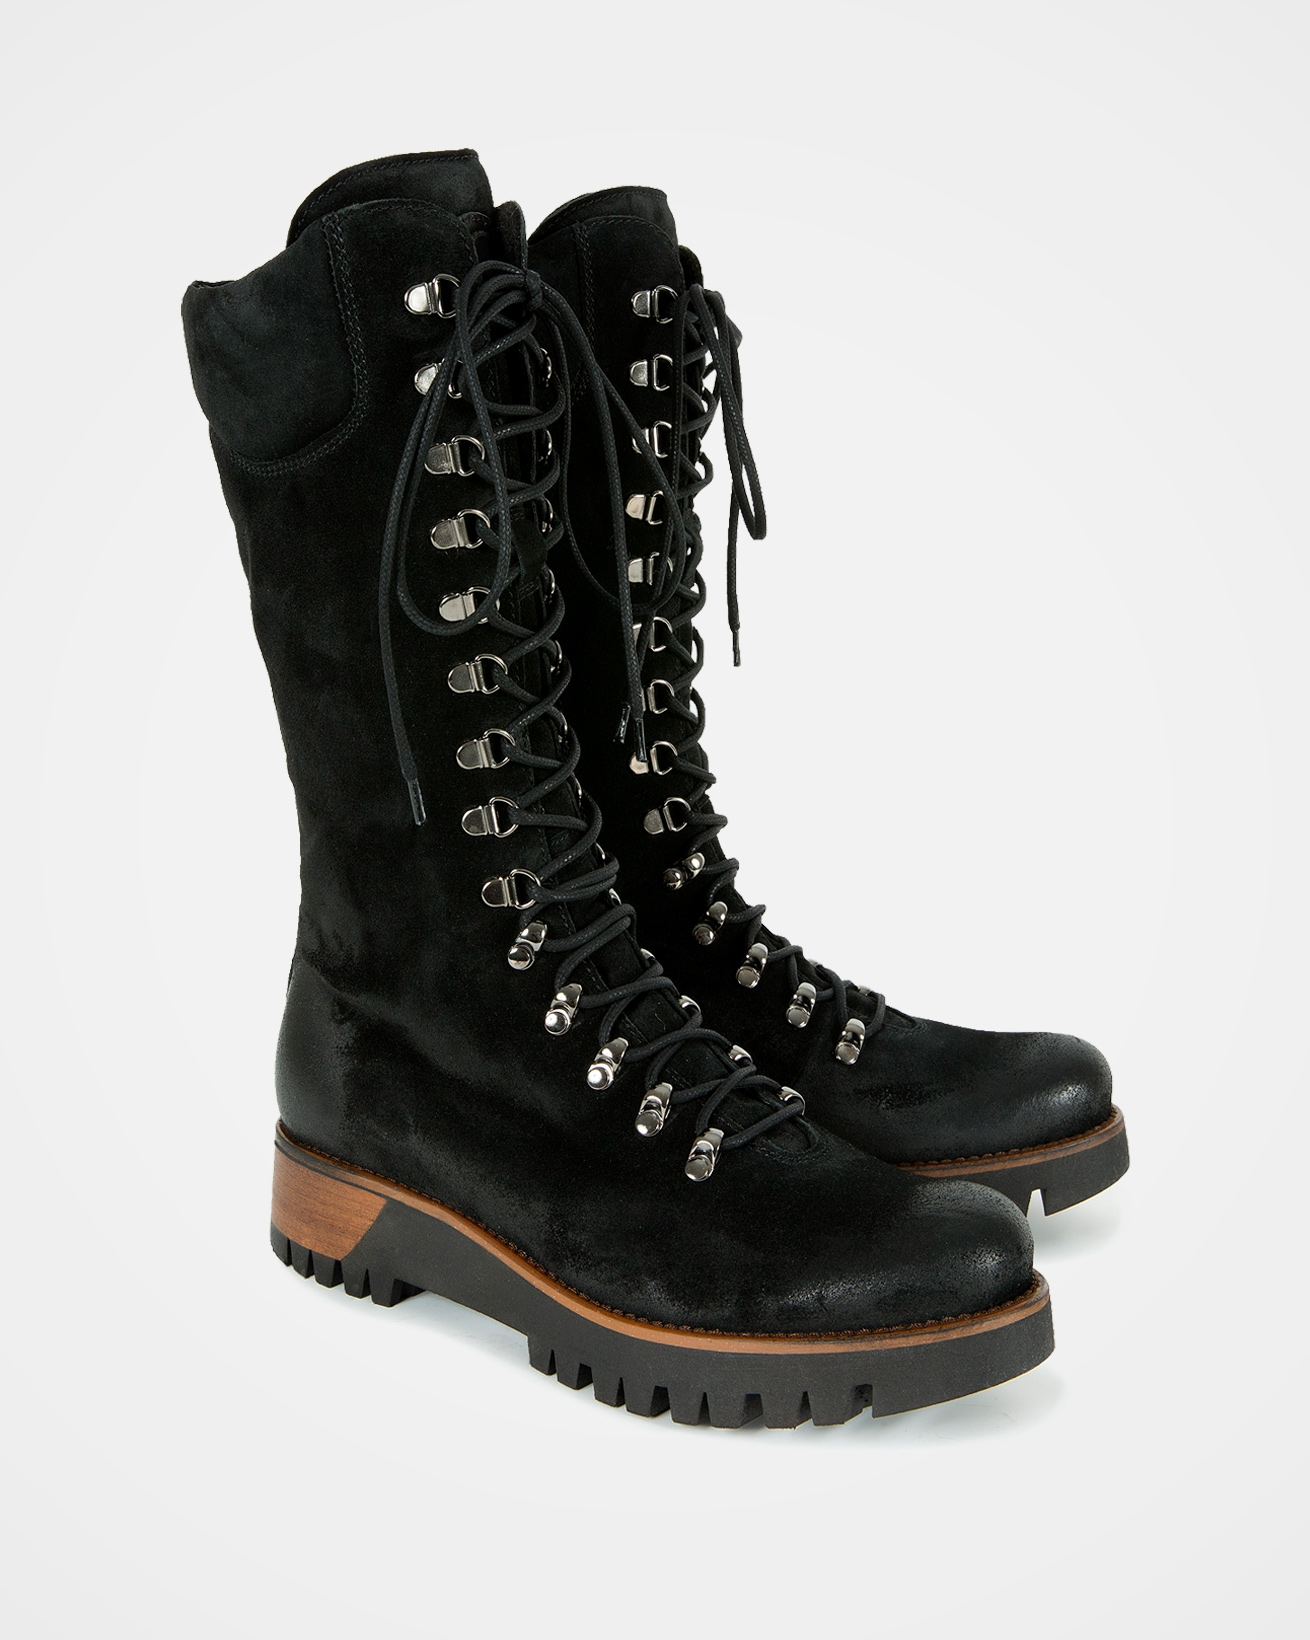 7082-wilderness-boots-black-pair-web-lfs-rev.jpg